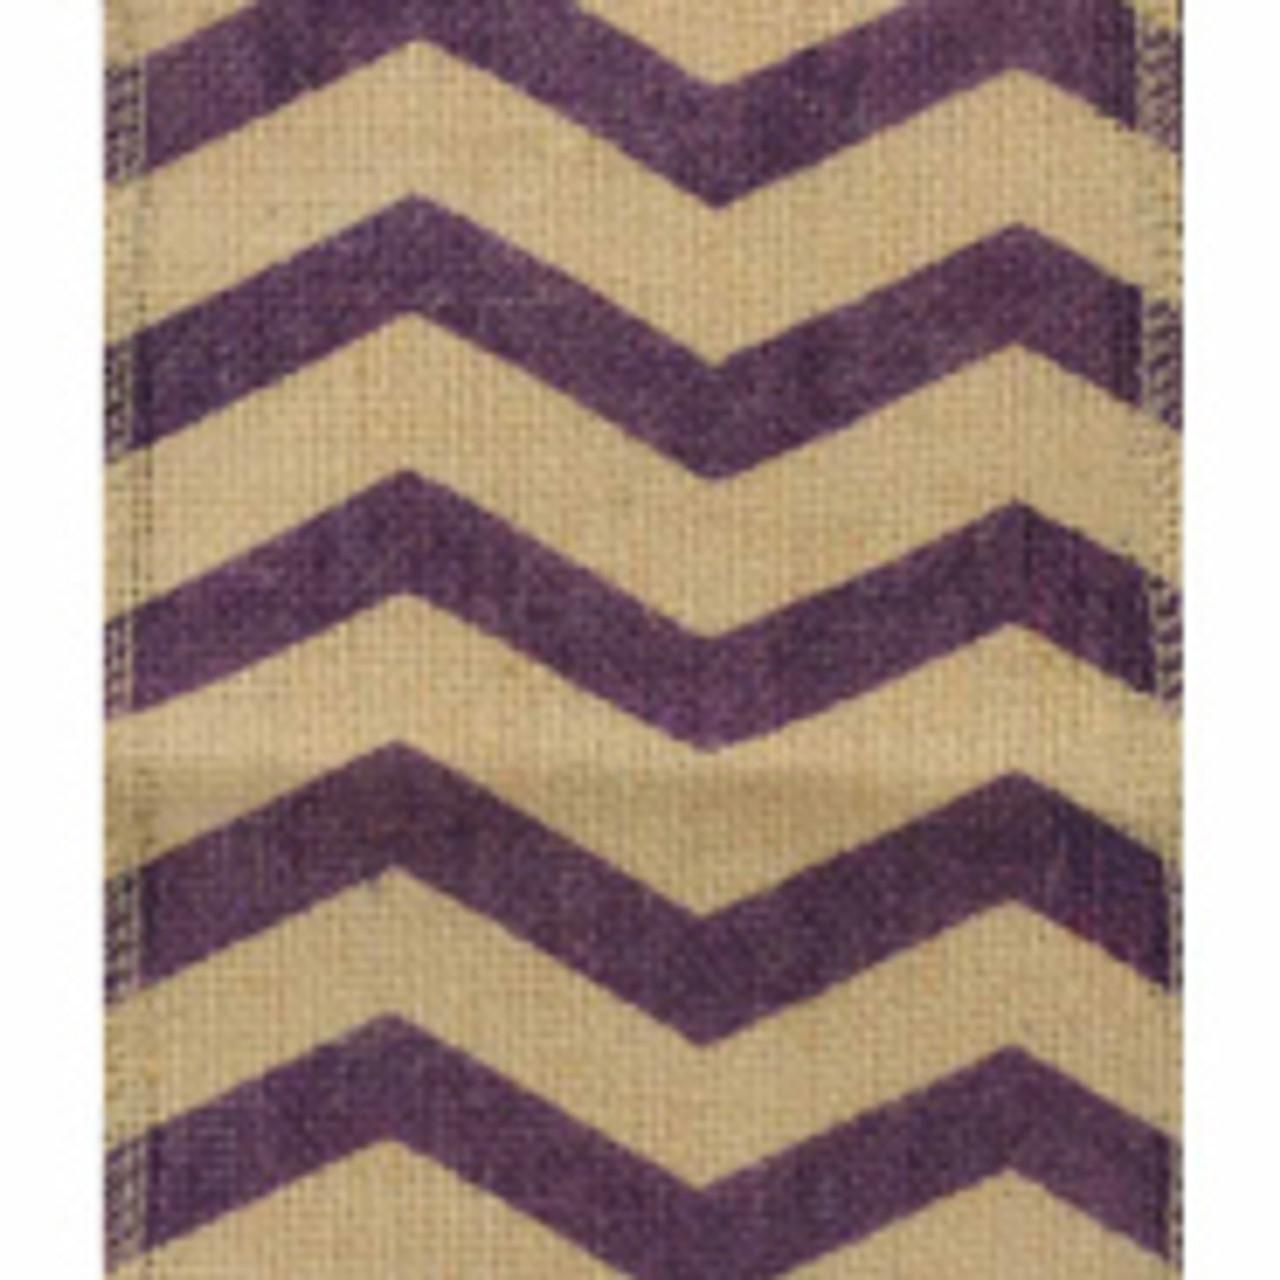 Purple 6 inch Chevron Burlap Ribbons